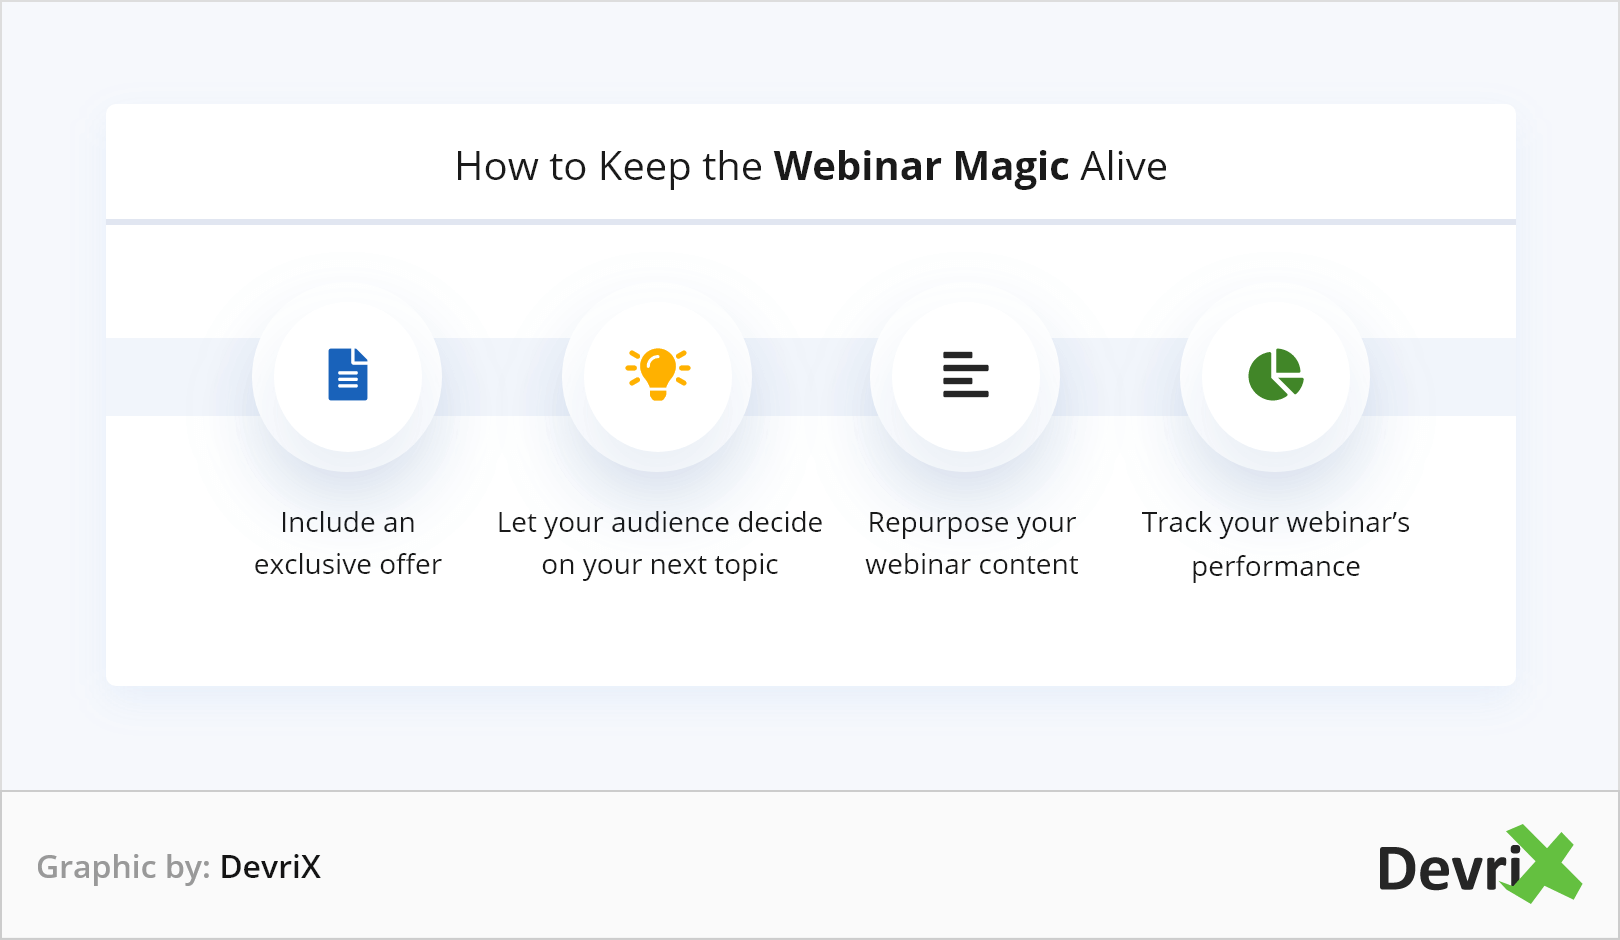 How to Keep The Webinar Magic Alive